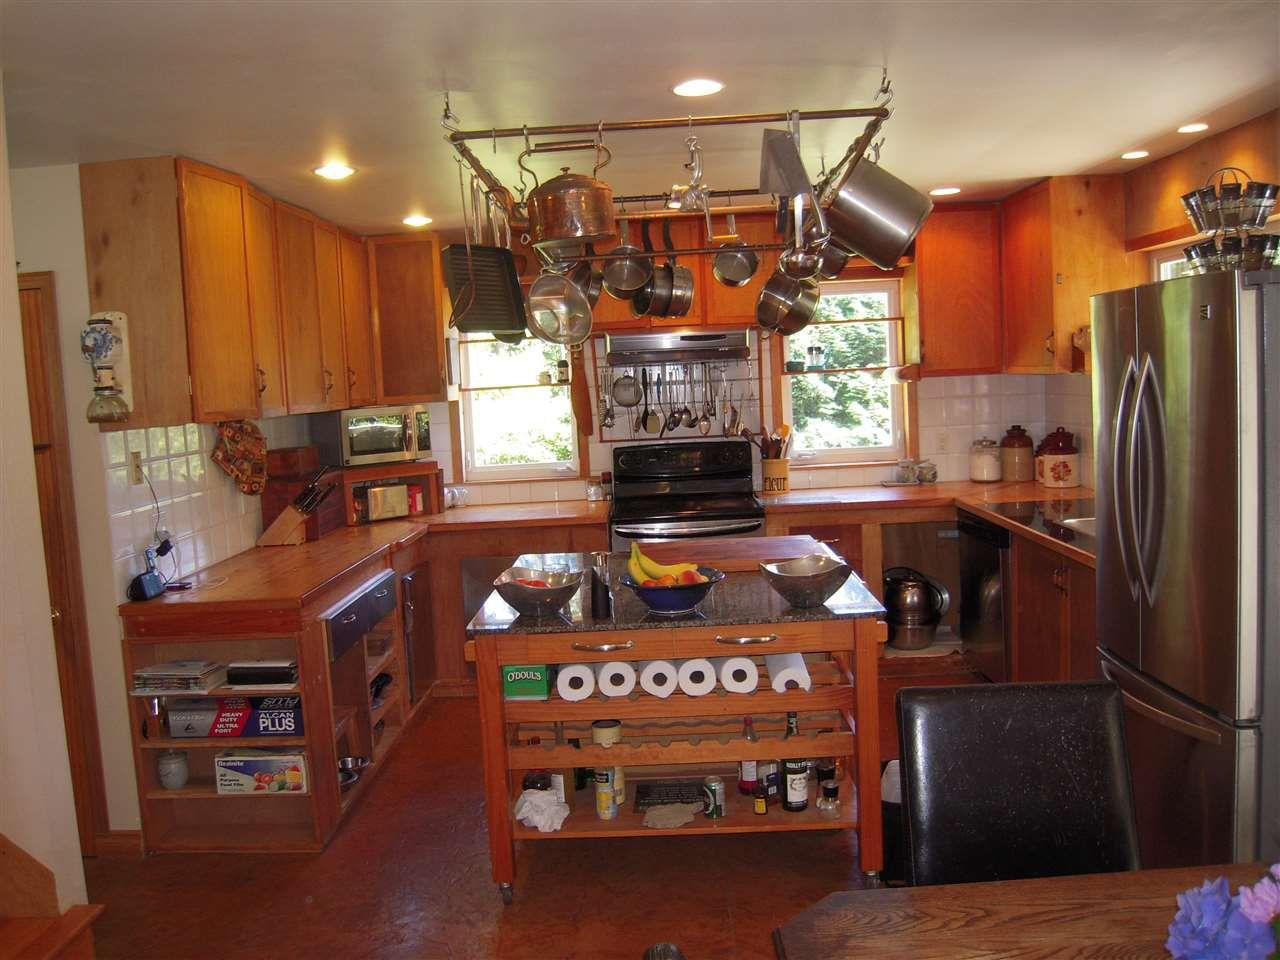 Photo 10: Photos: 2670 LOWER Road: Roberts Creek House for sale (Sunshine Coast)  : MLS®# R2096275